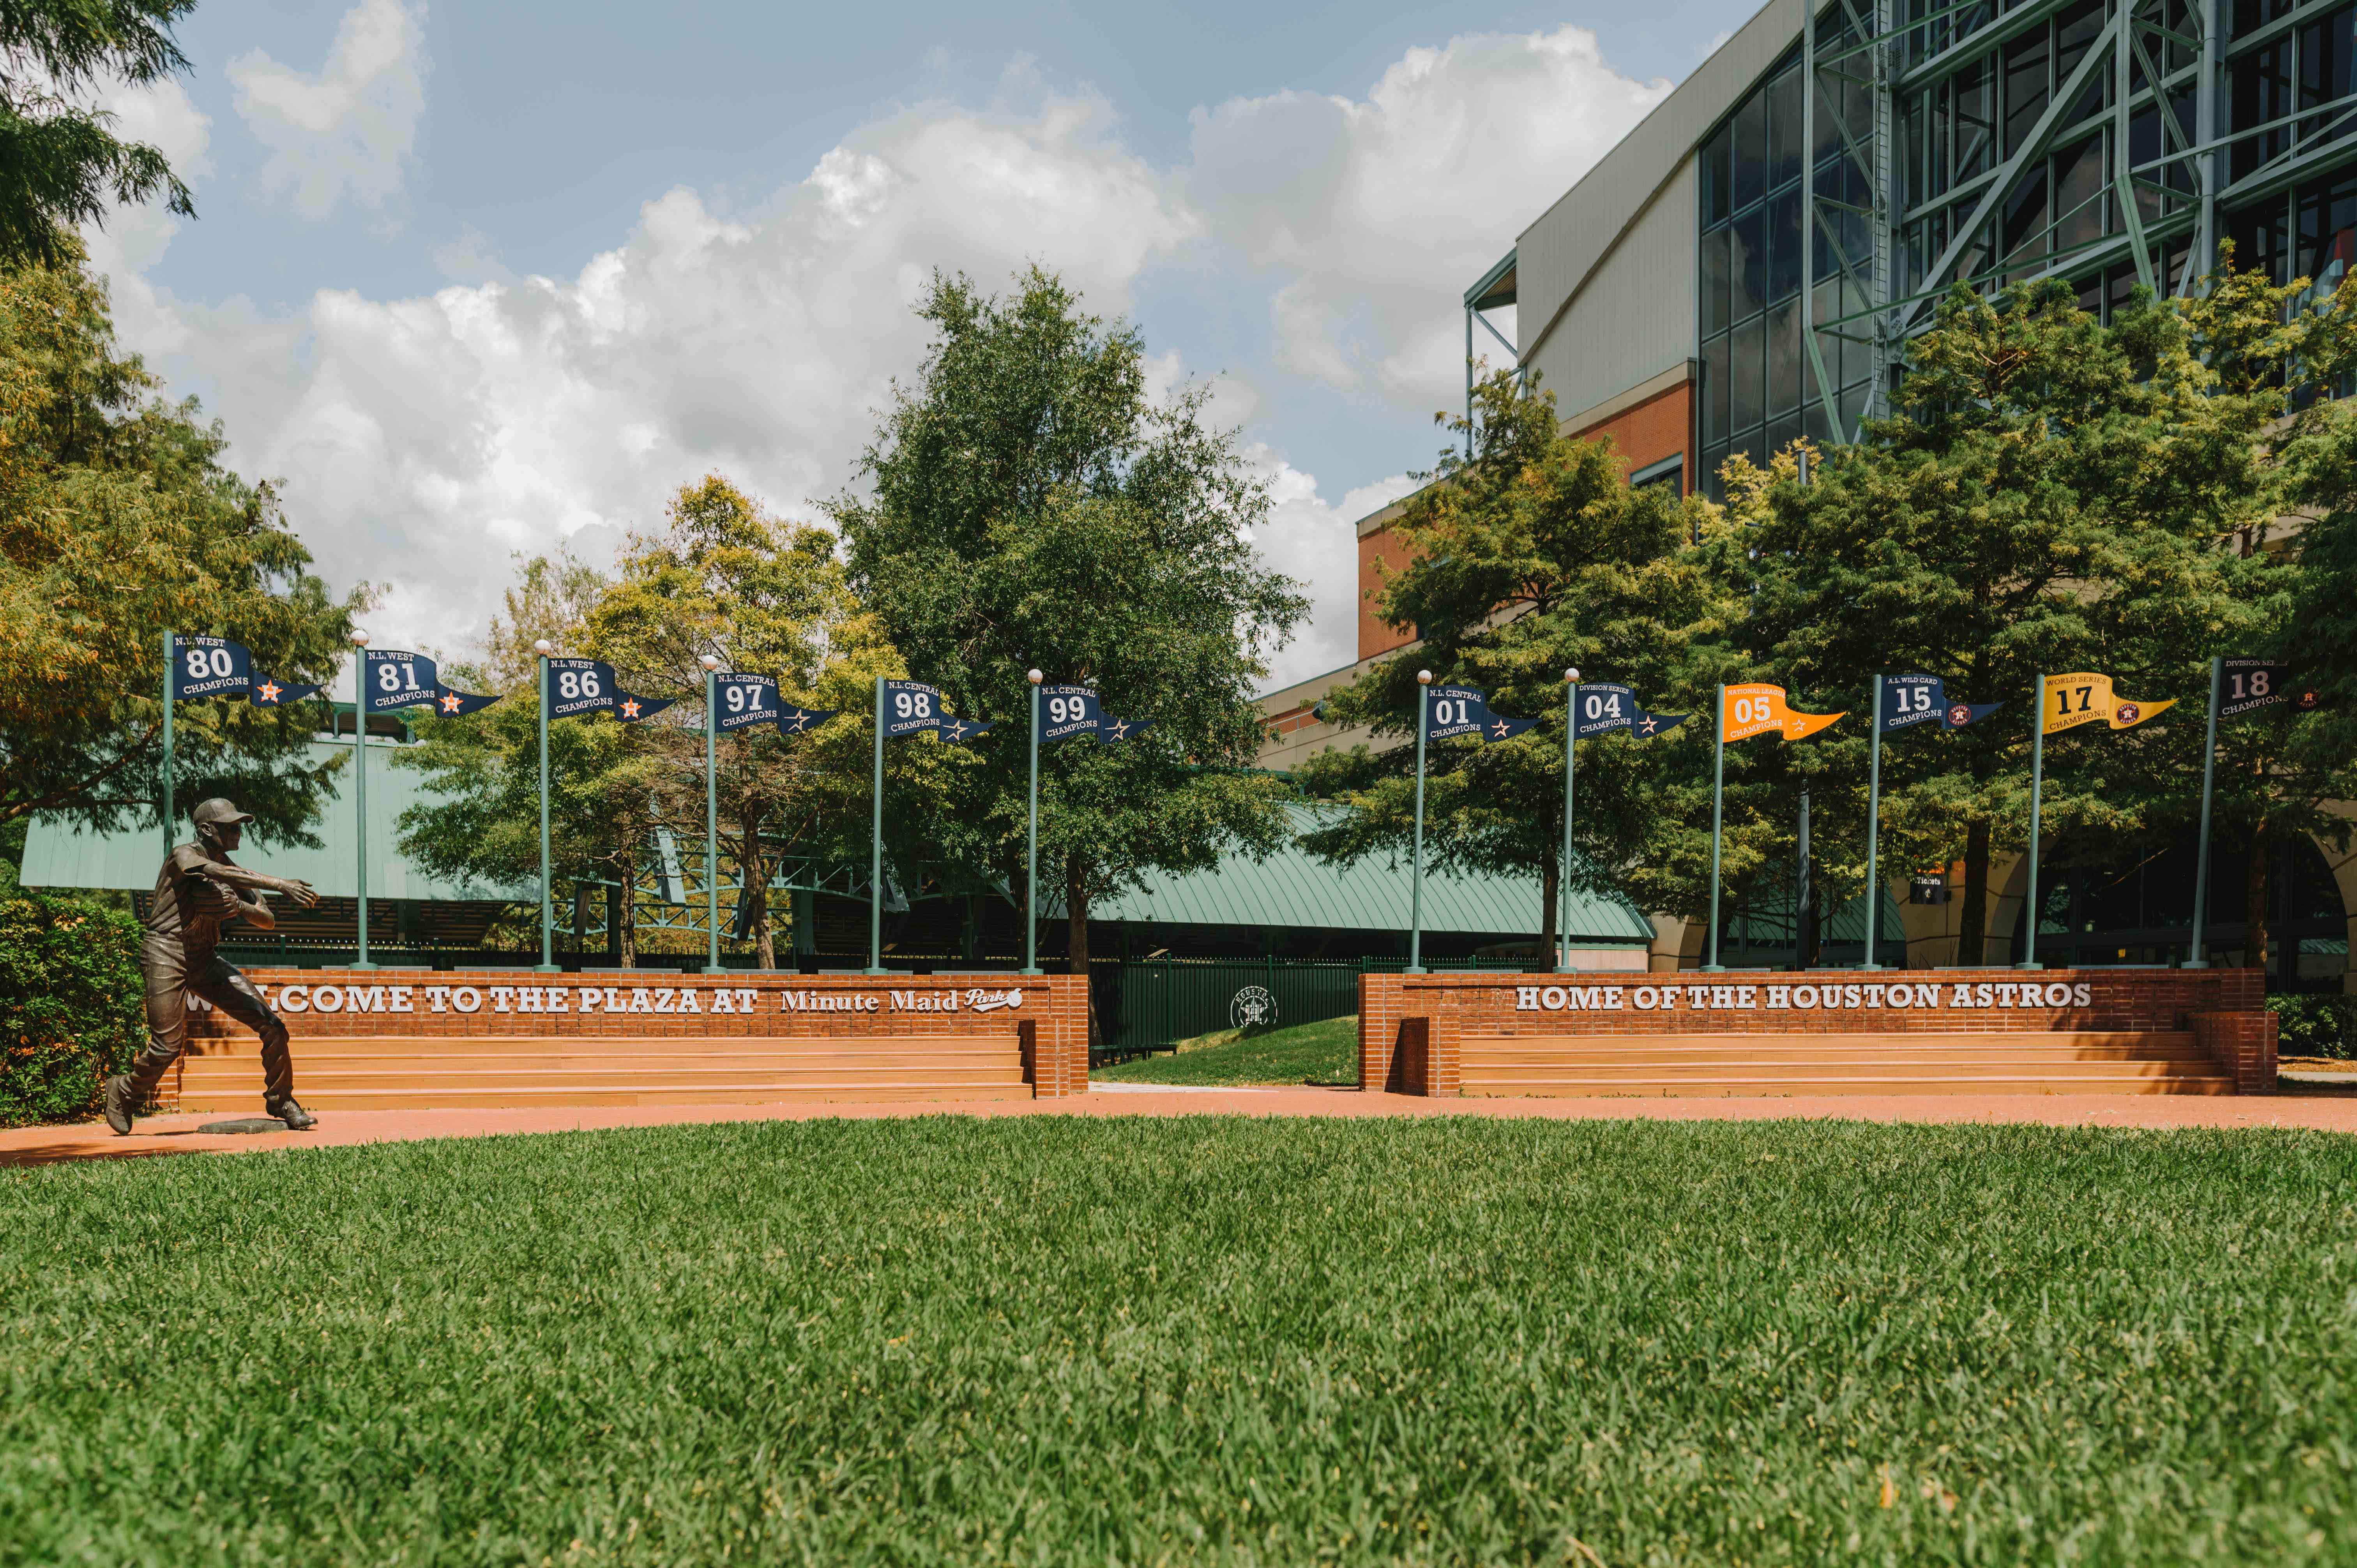 Entrance to the Astros stadium